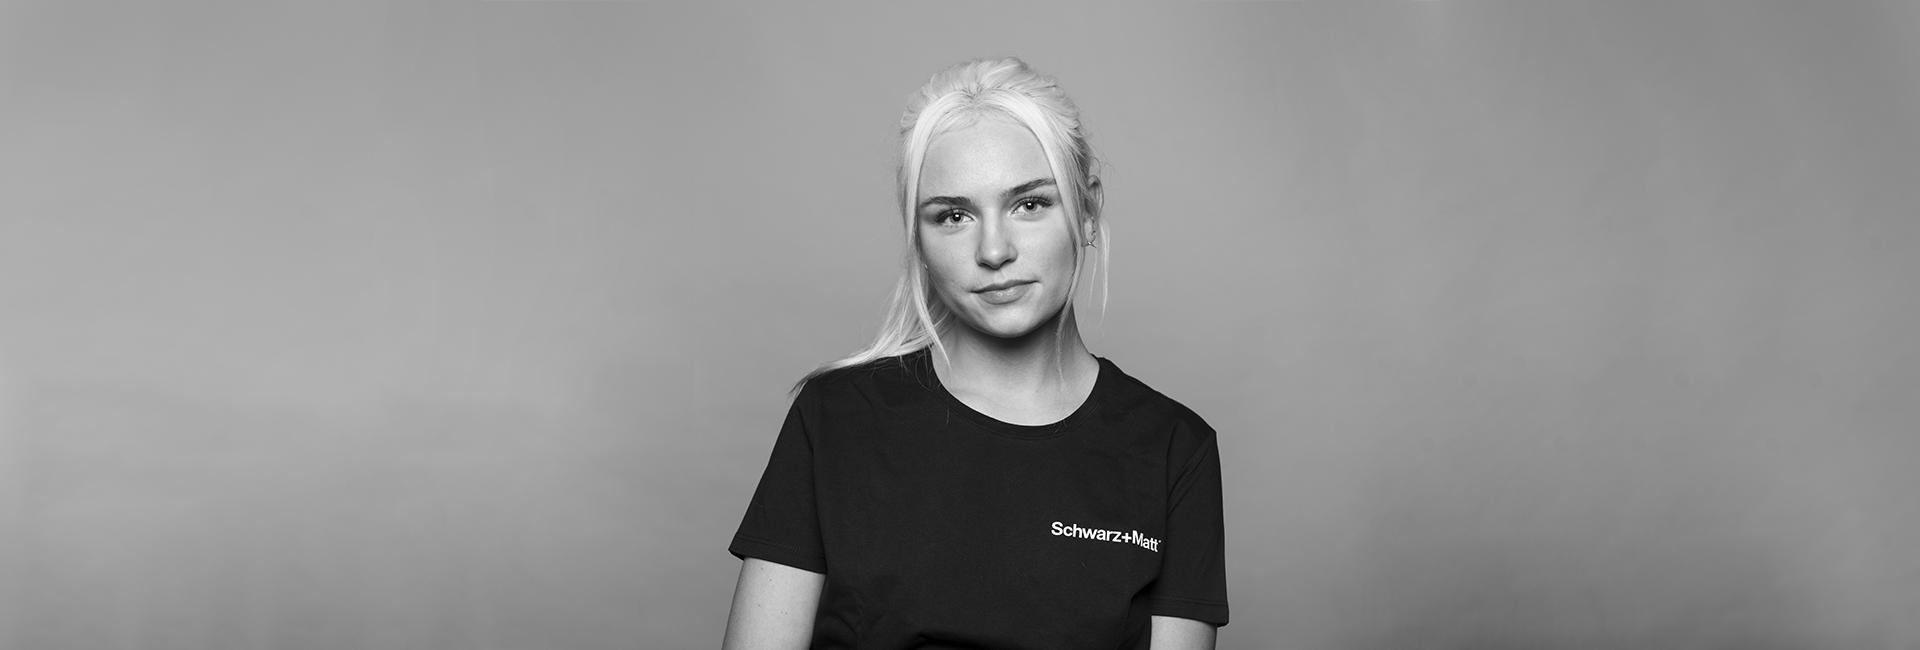 Emily Dyk - Influencer Marketing Manager